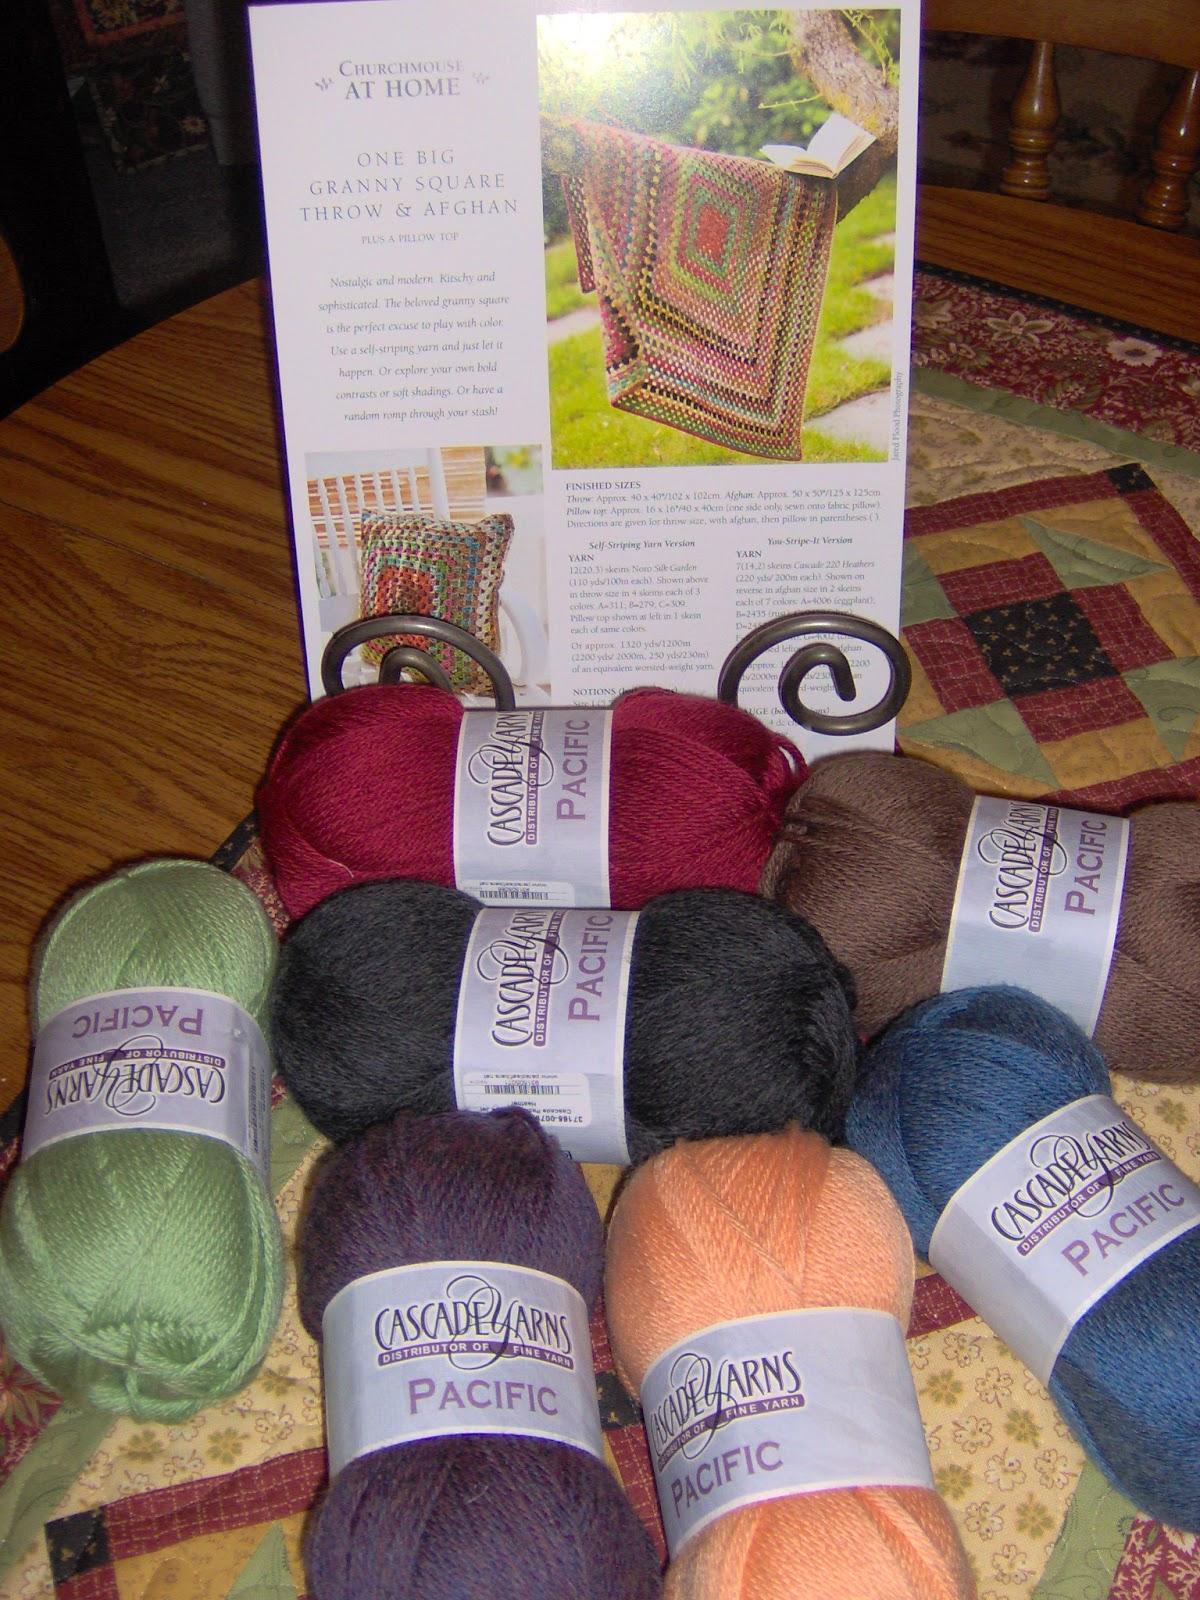 Review - Granny Square Afghan Crochet Kit